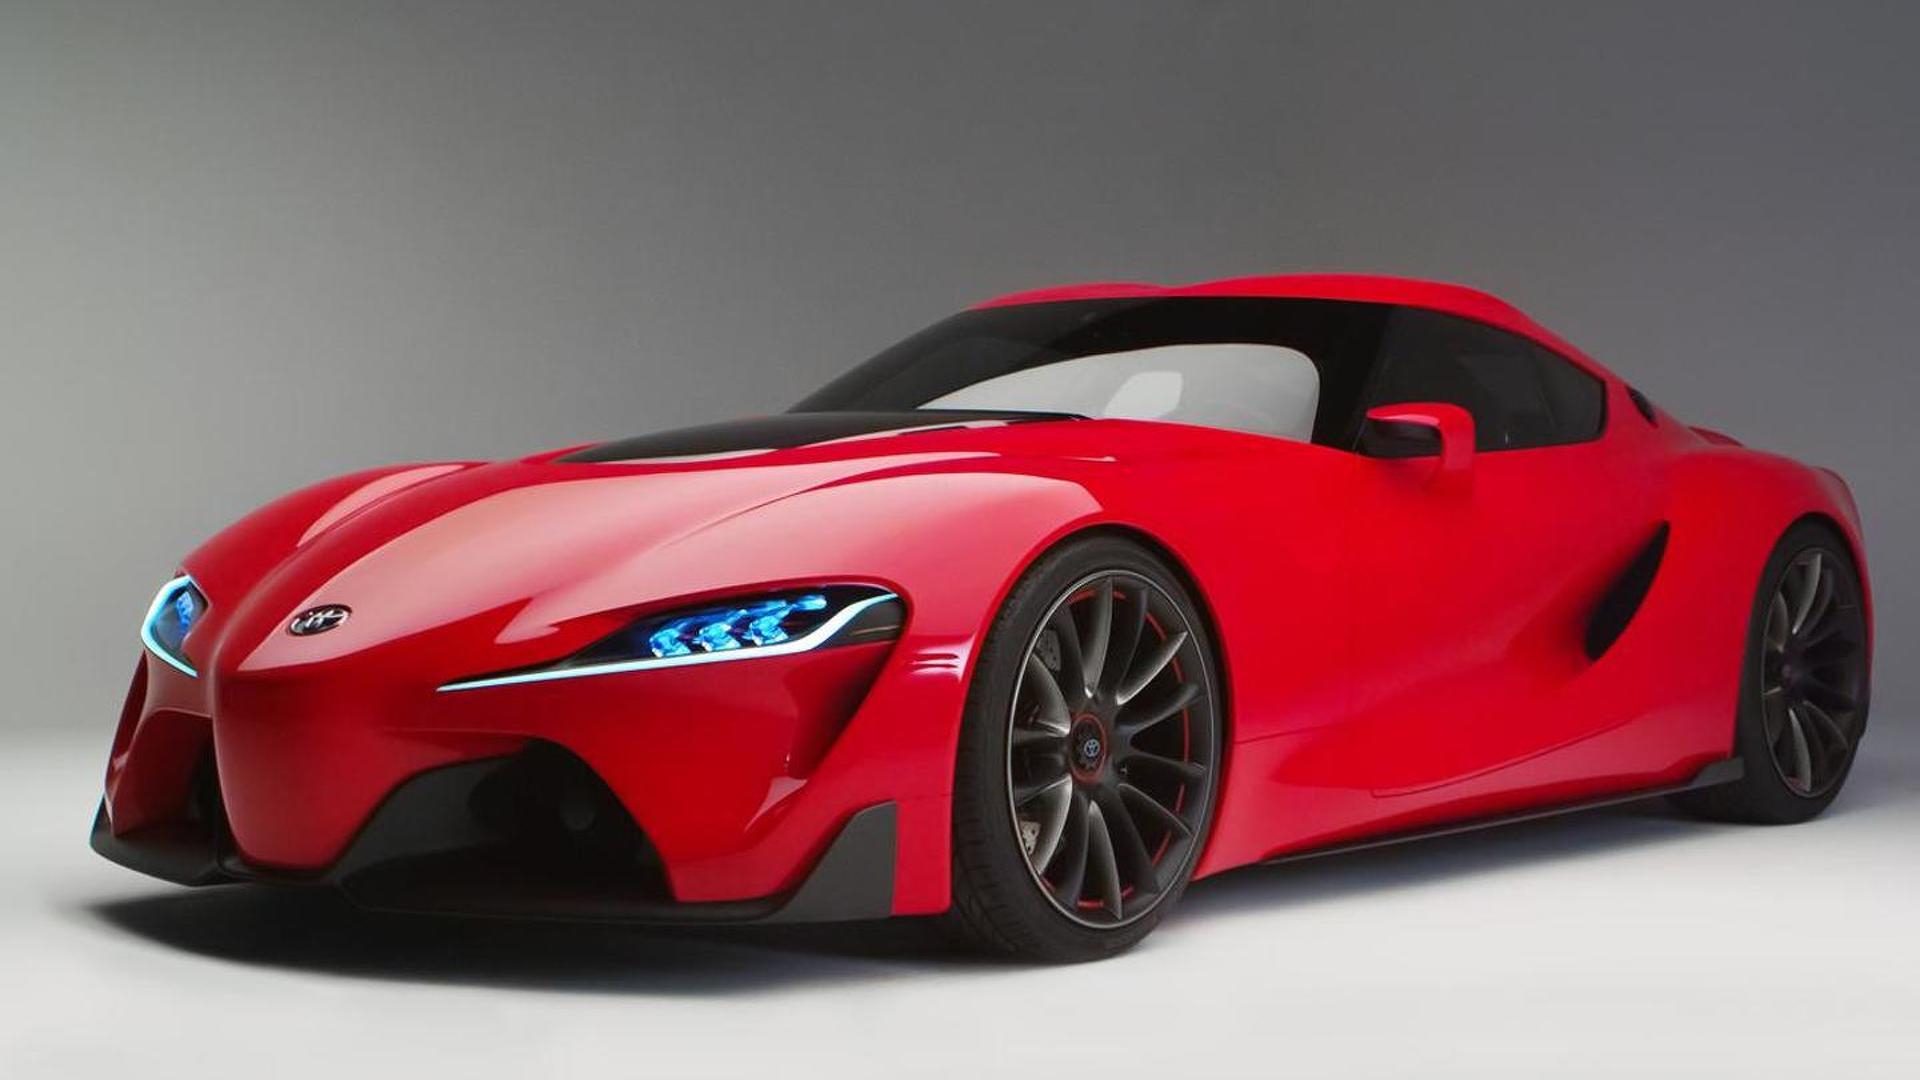 Toyota confirms hybrid turbo engine for Supra